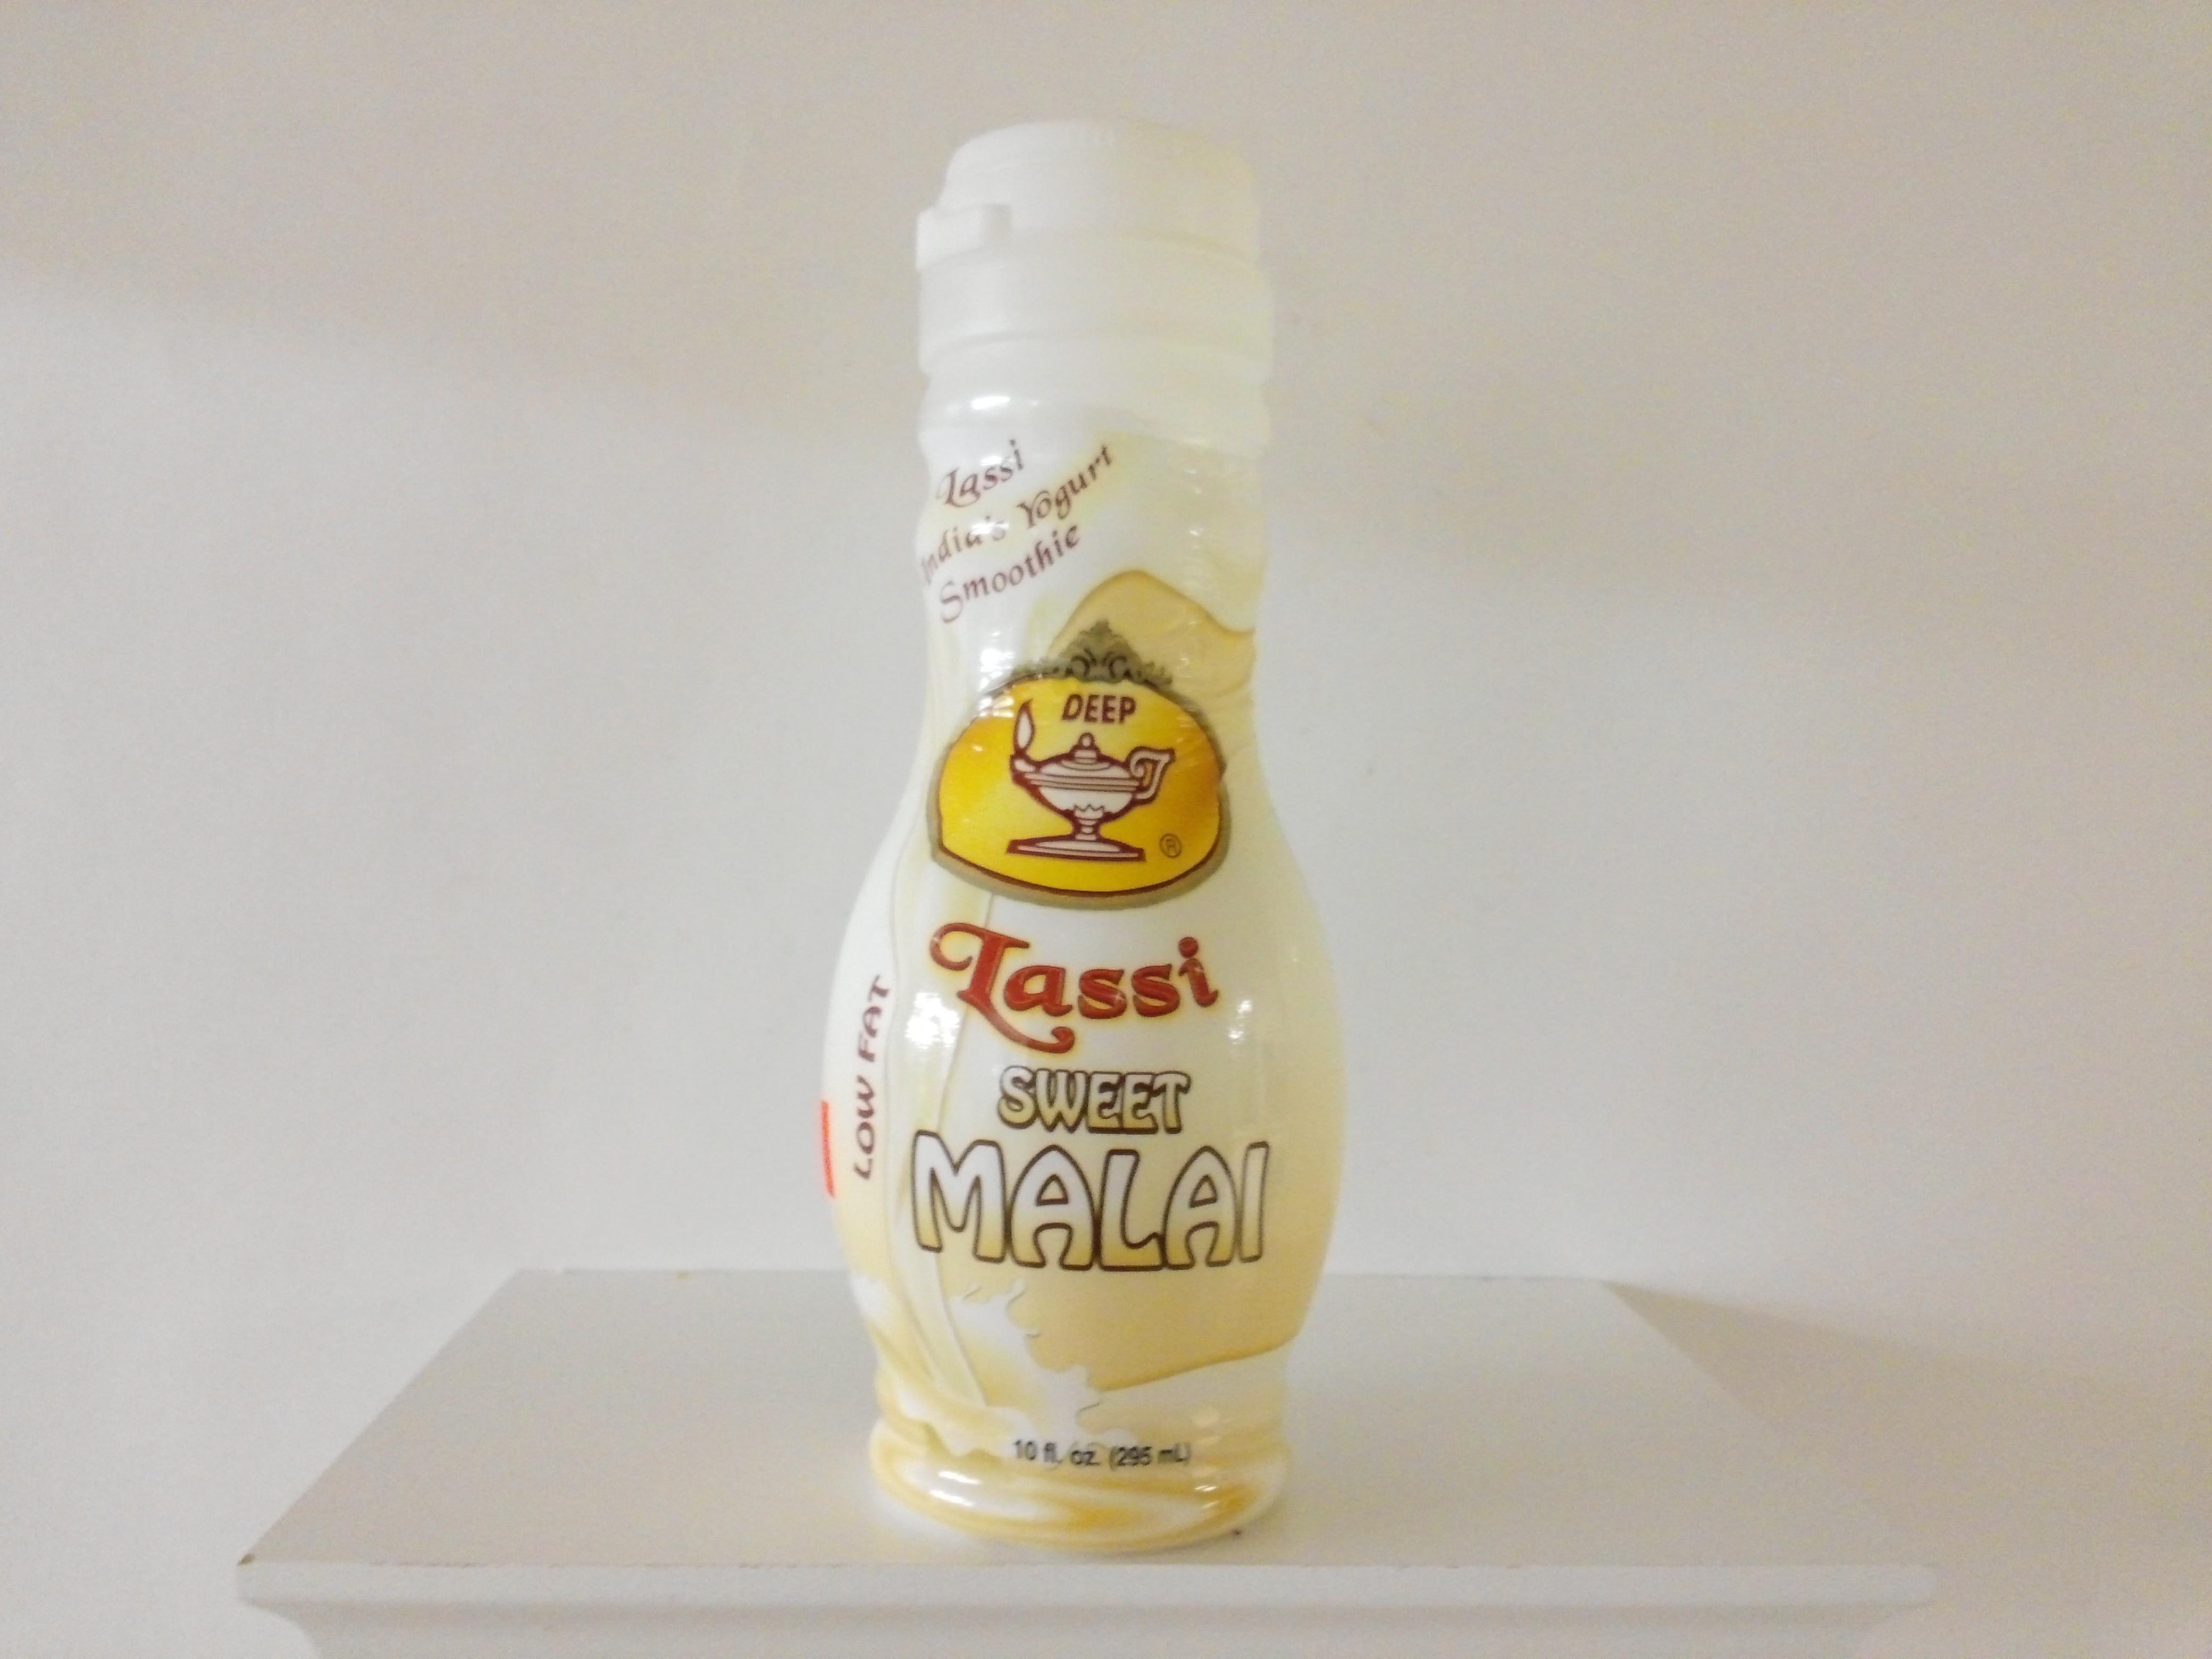 Deep Low Fat Lassi Sweet Malai 10 oz